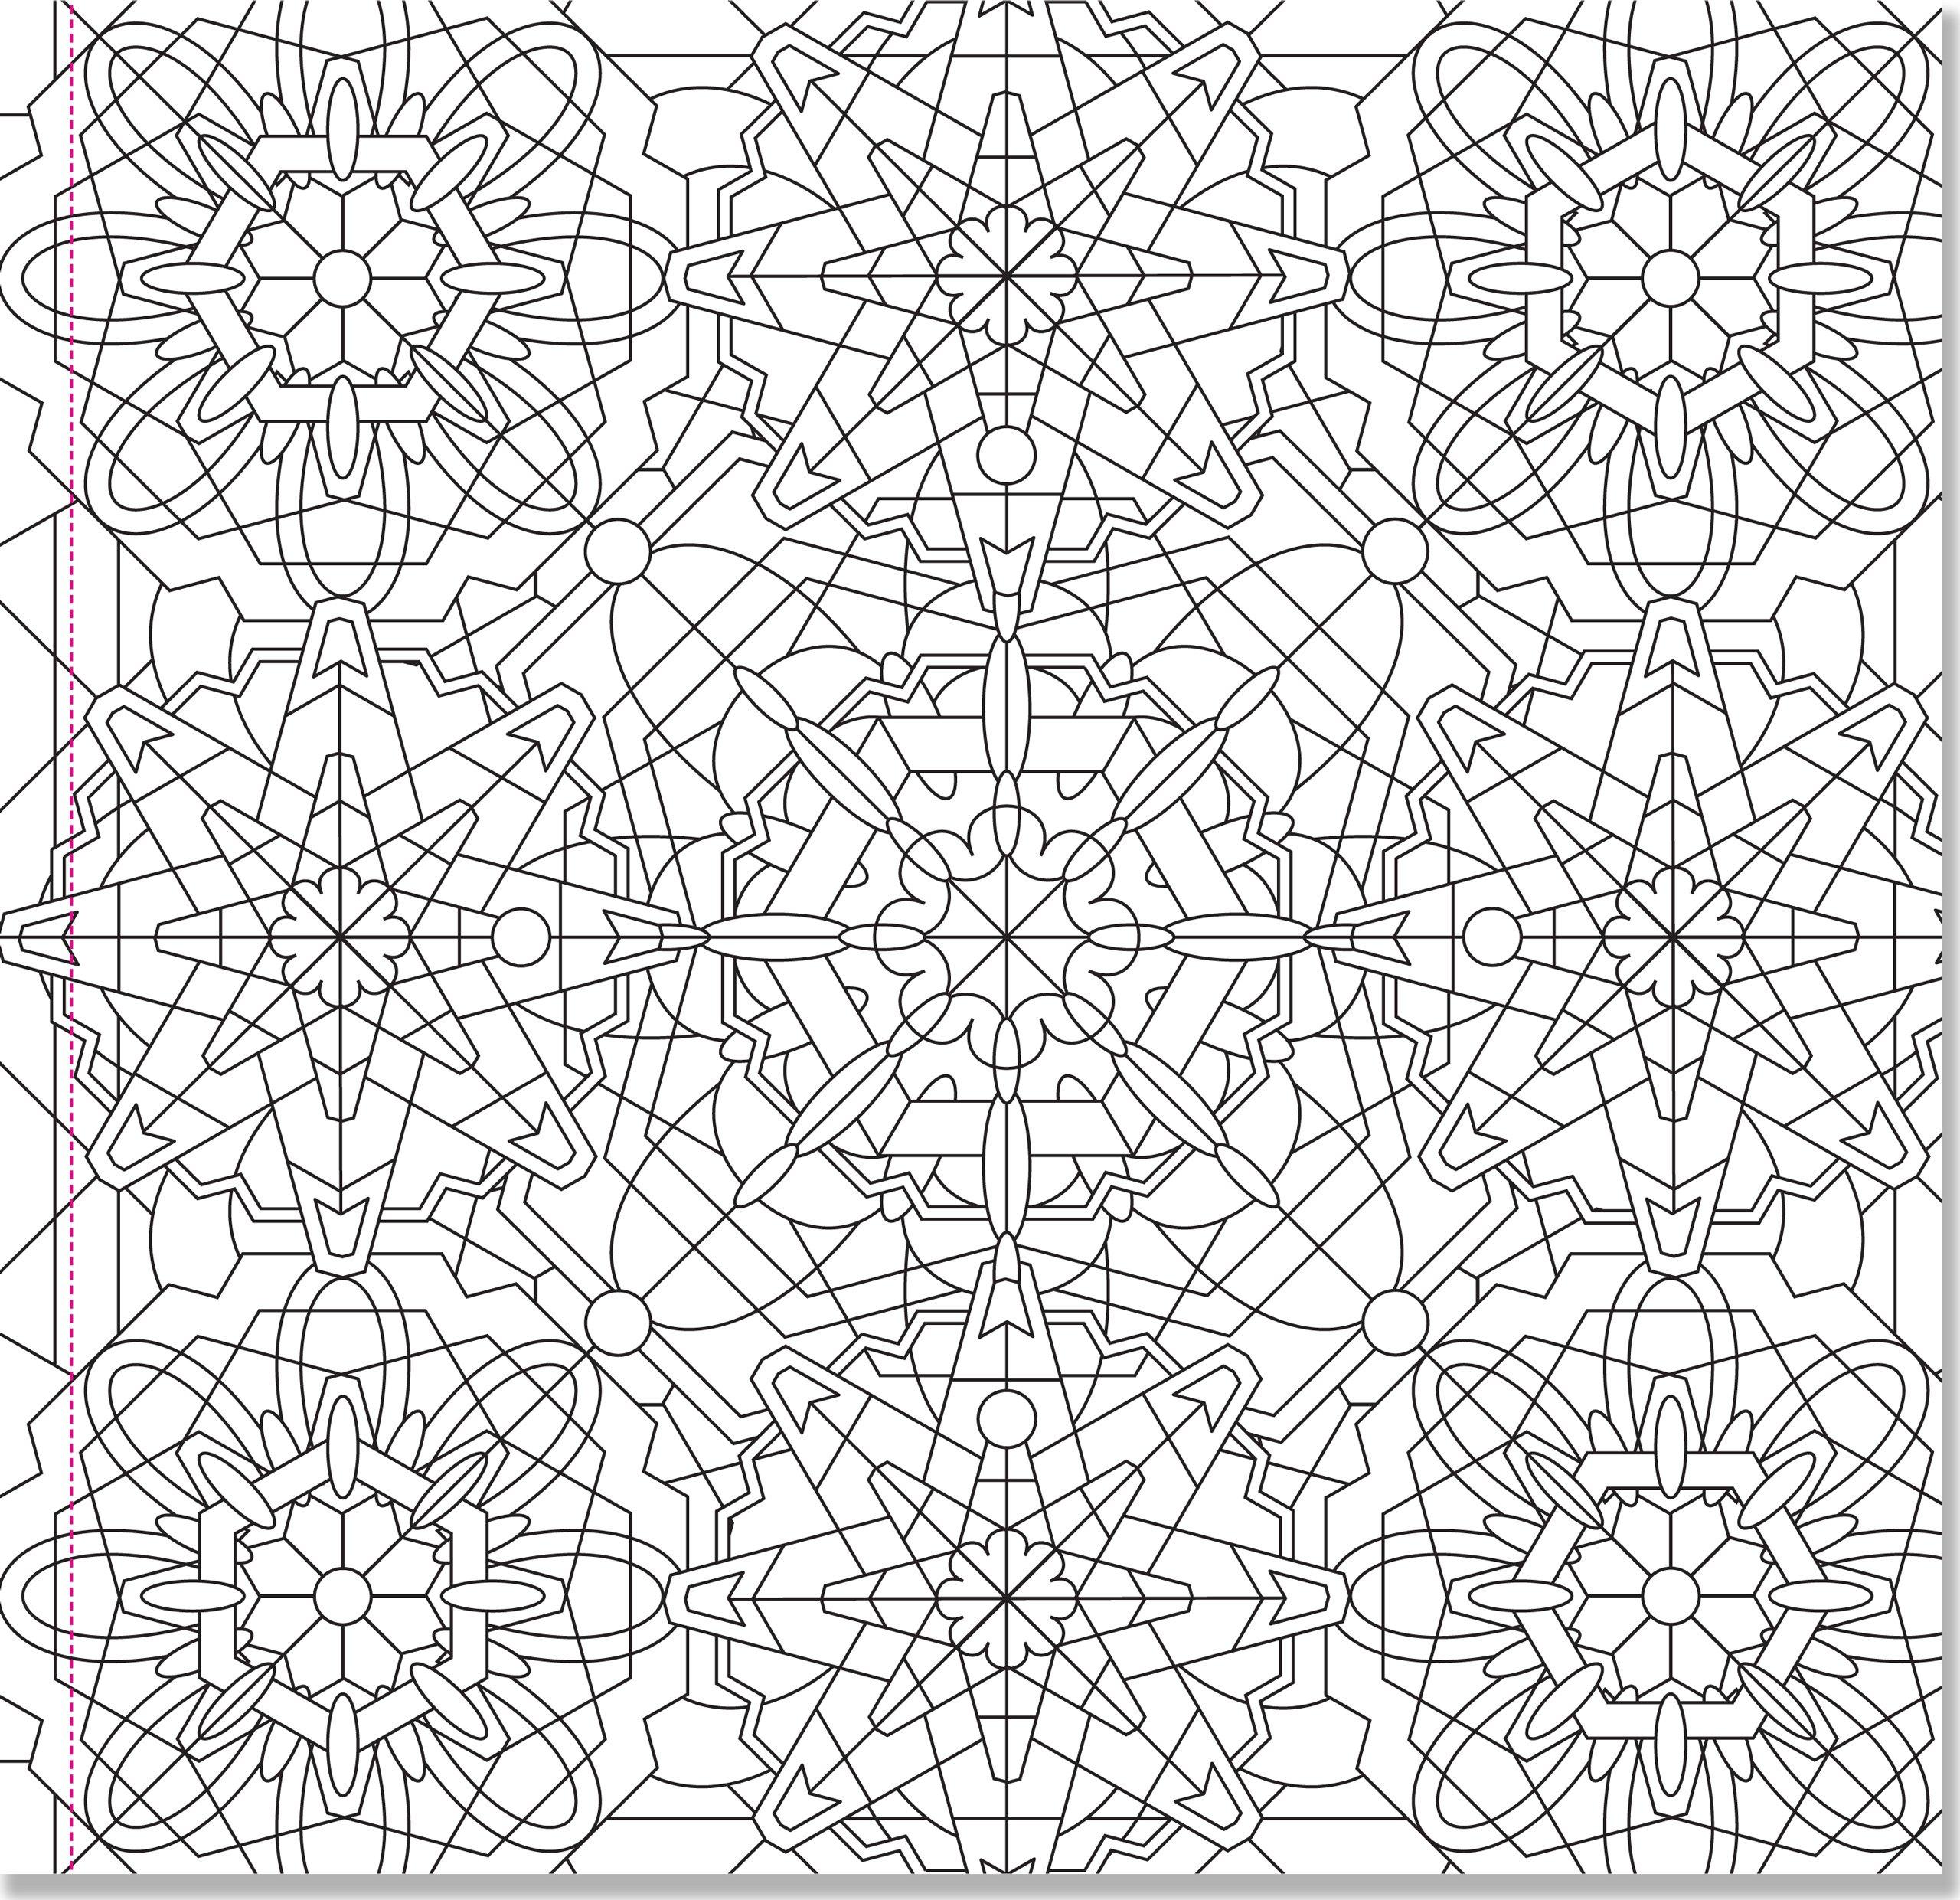 Amazon Kaleidoscope Designs Adult Coloring Book 31 Stress Relieving Studio 9781441318398 Peter Pauper Press Books